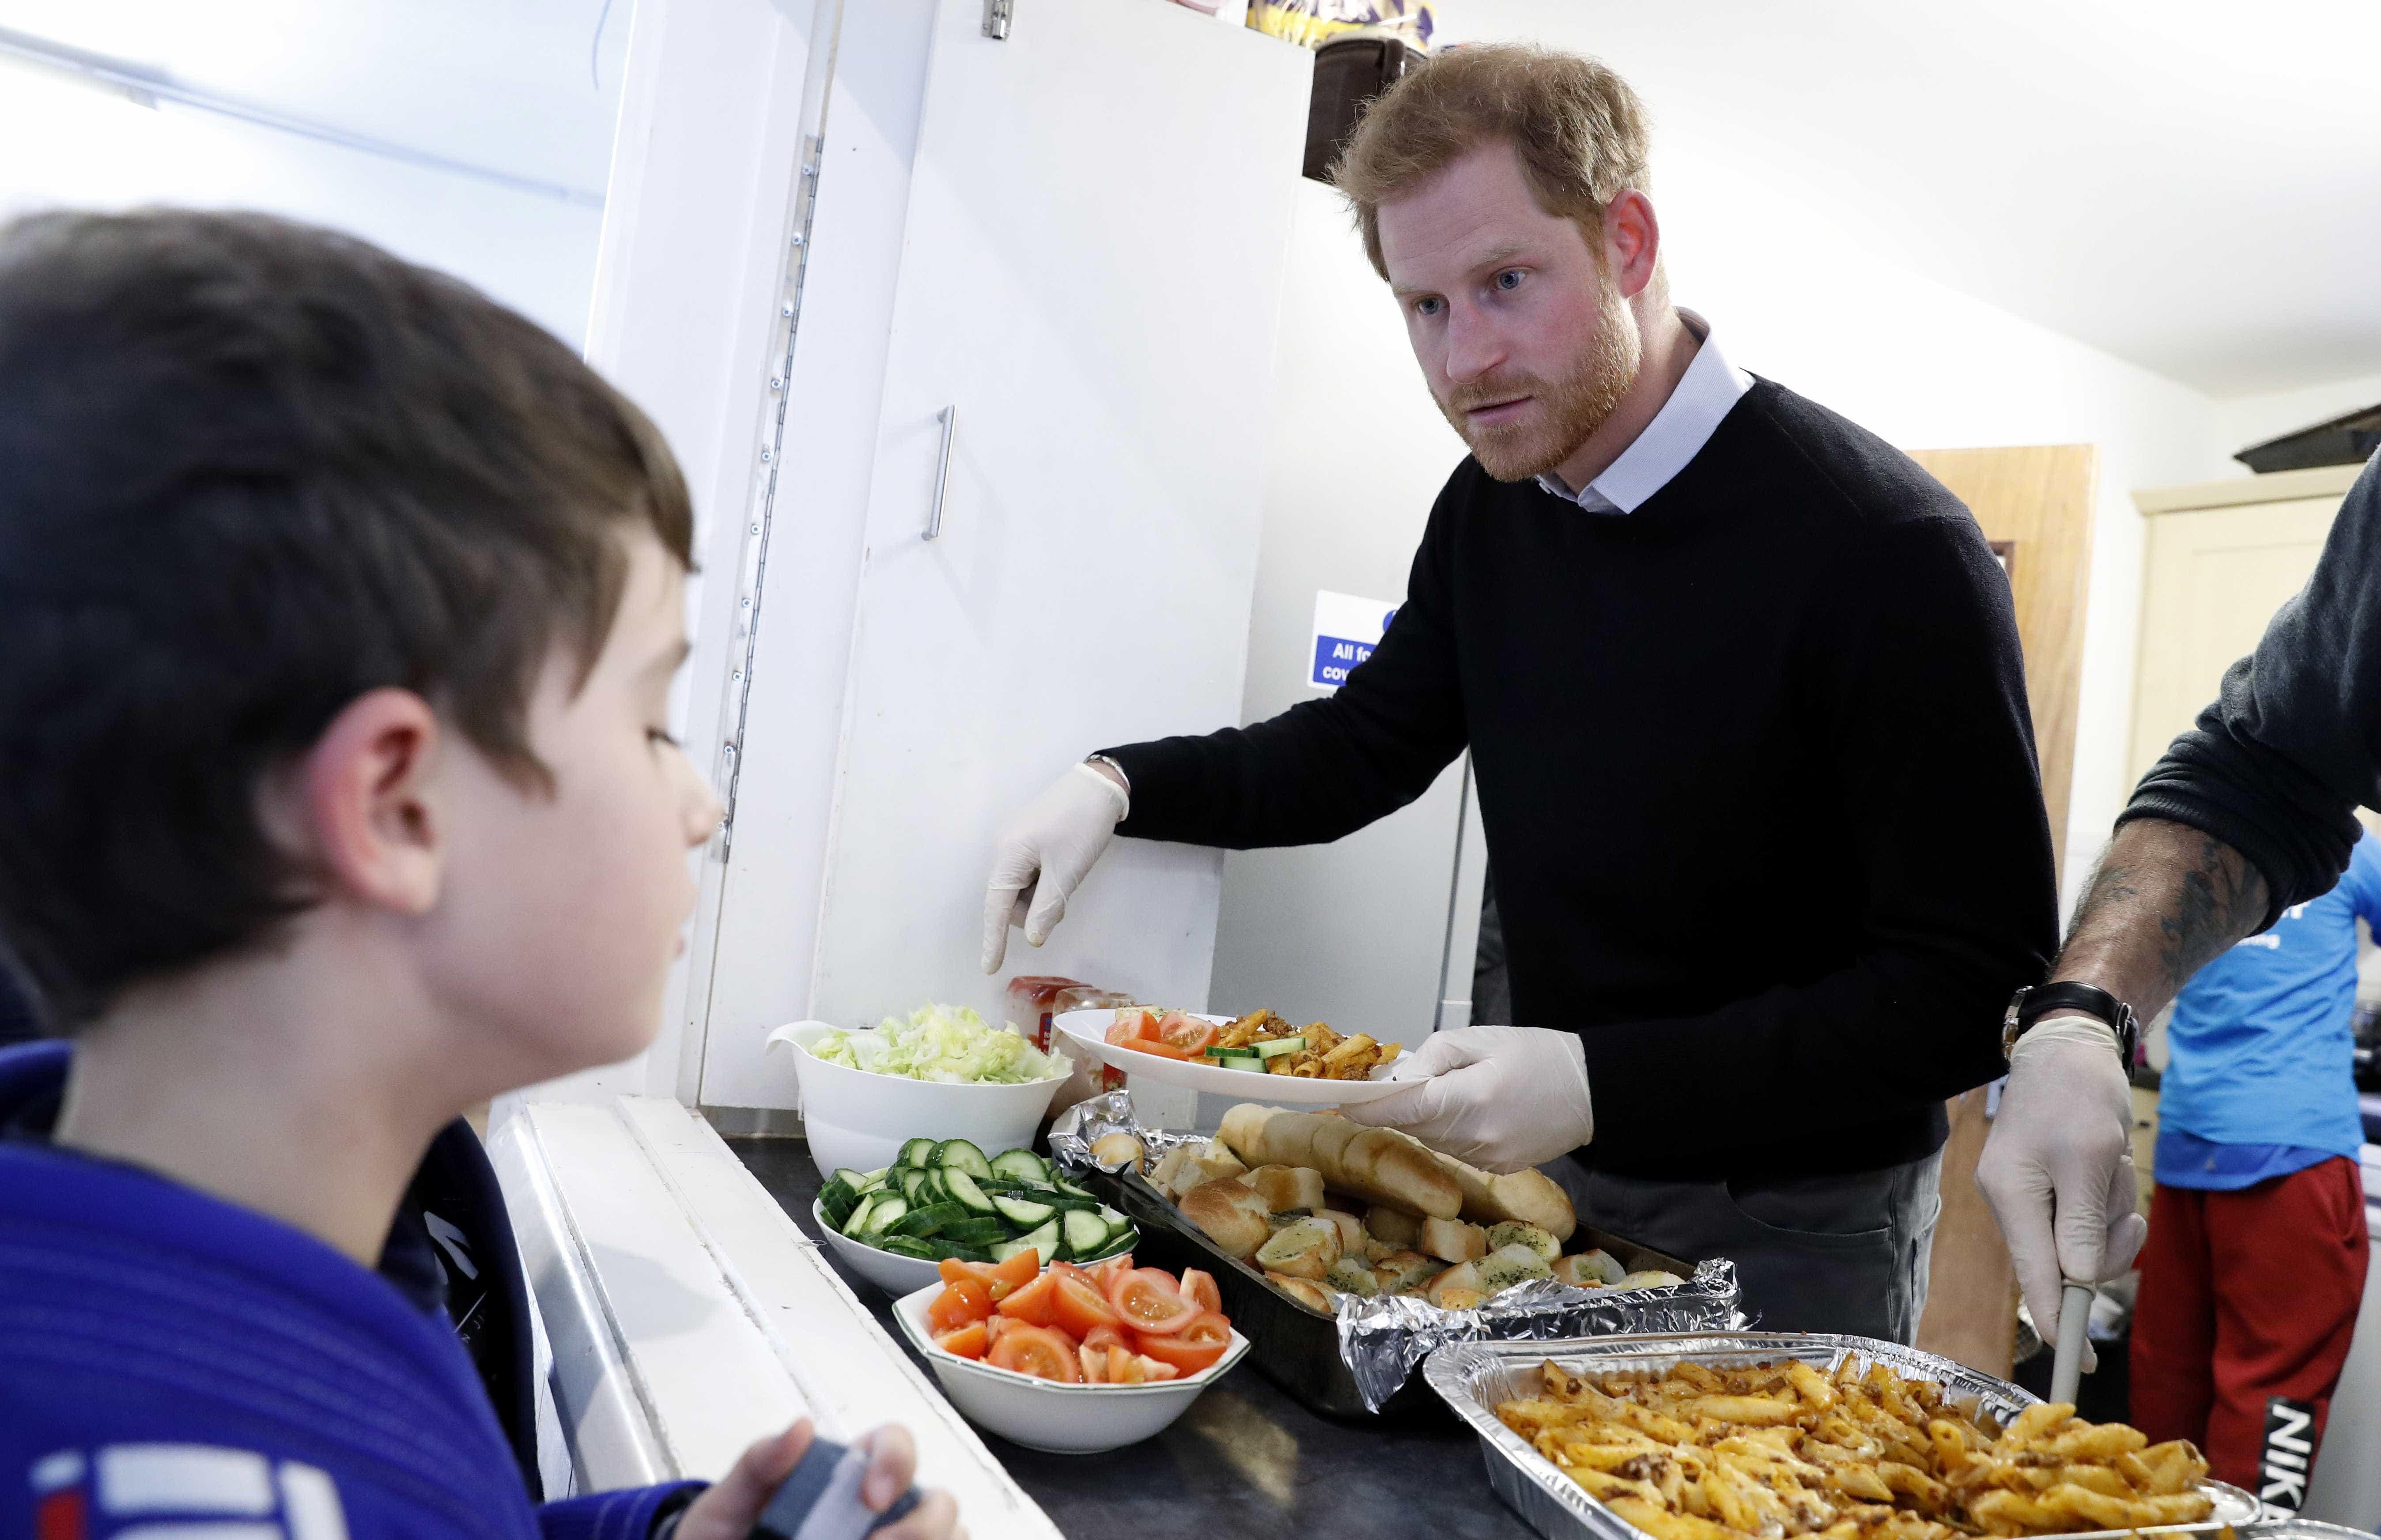 Longe de Meghan Markle, príncipe Harry almoça com jovens